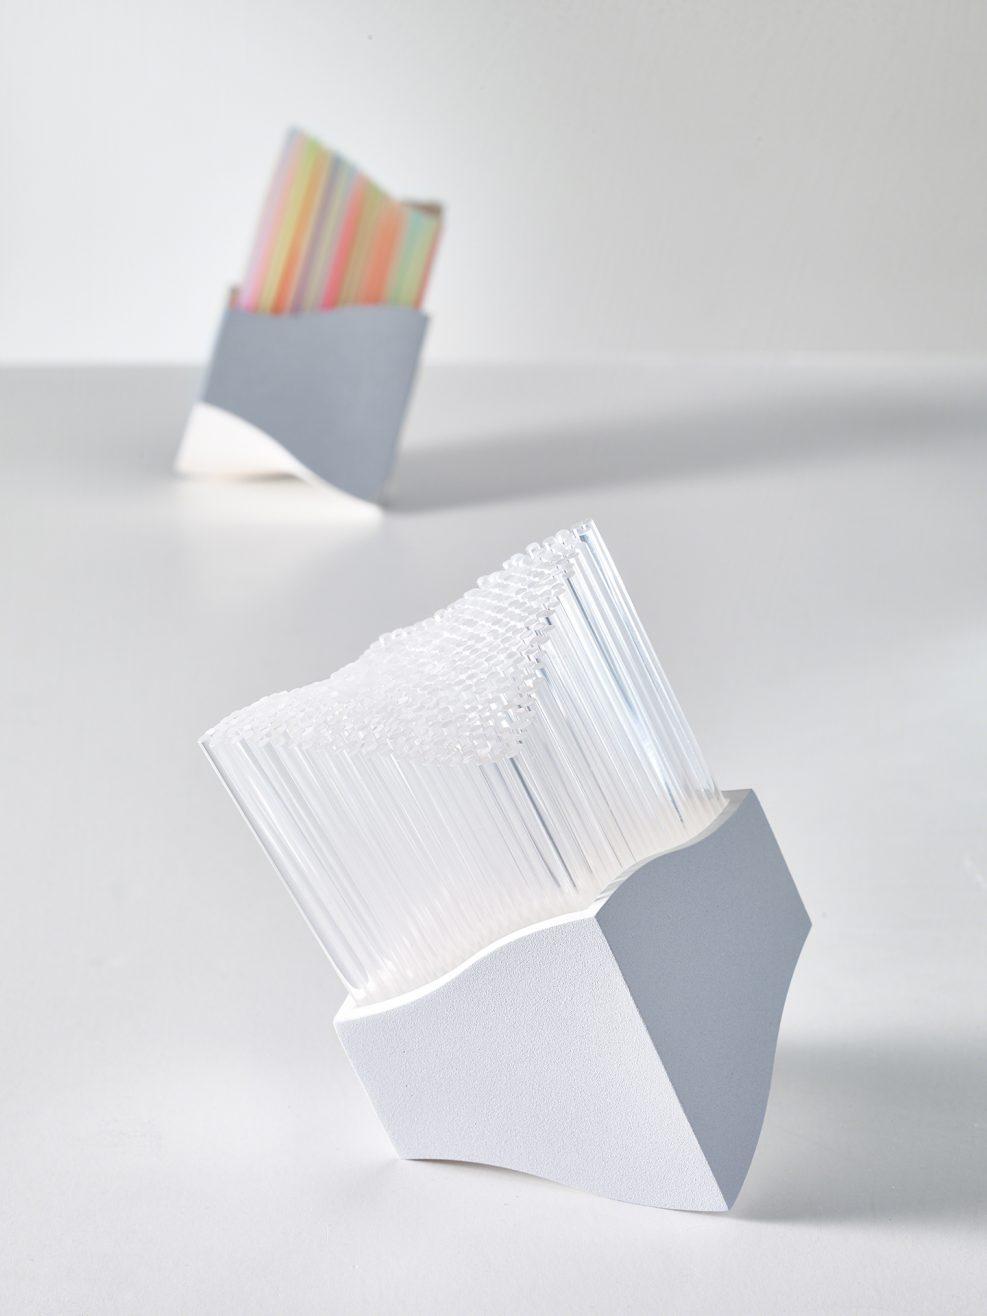 Kyra Spieker, Keramik, Glas, Frechen, Ausstellung, Kunst, Abstrakt, Produktfotografie, AR, Articus & Röttgen, Helge Articus, Fotografie